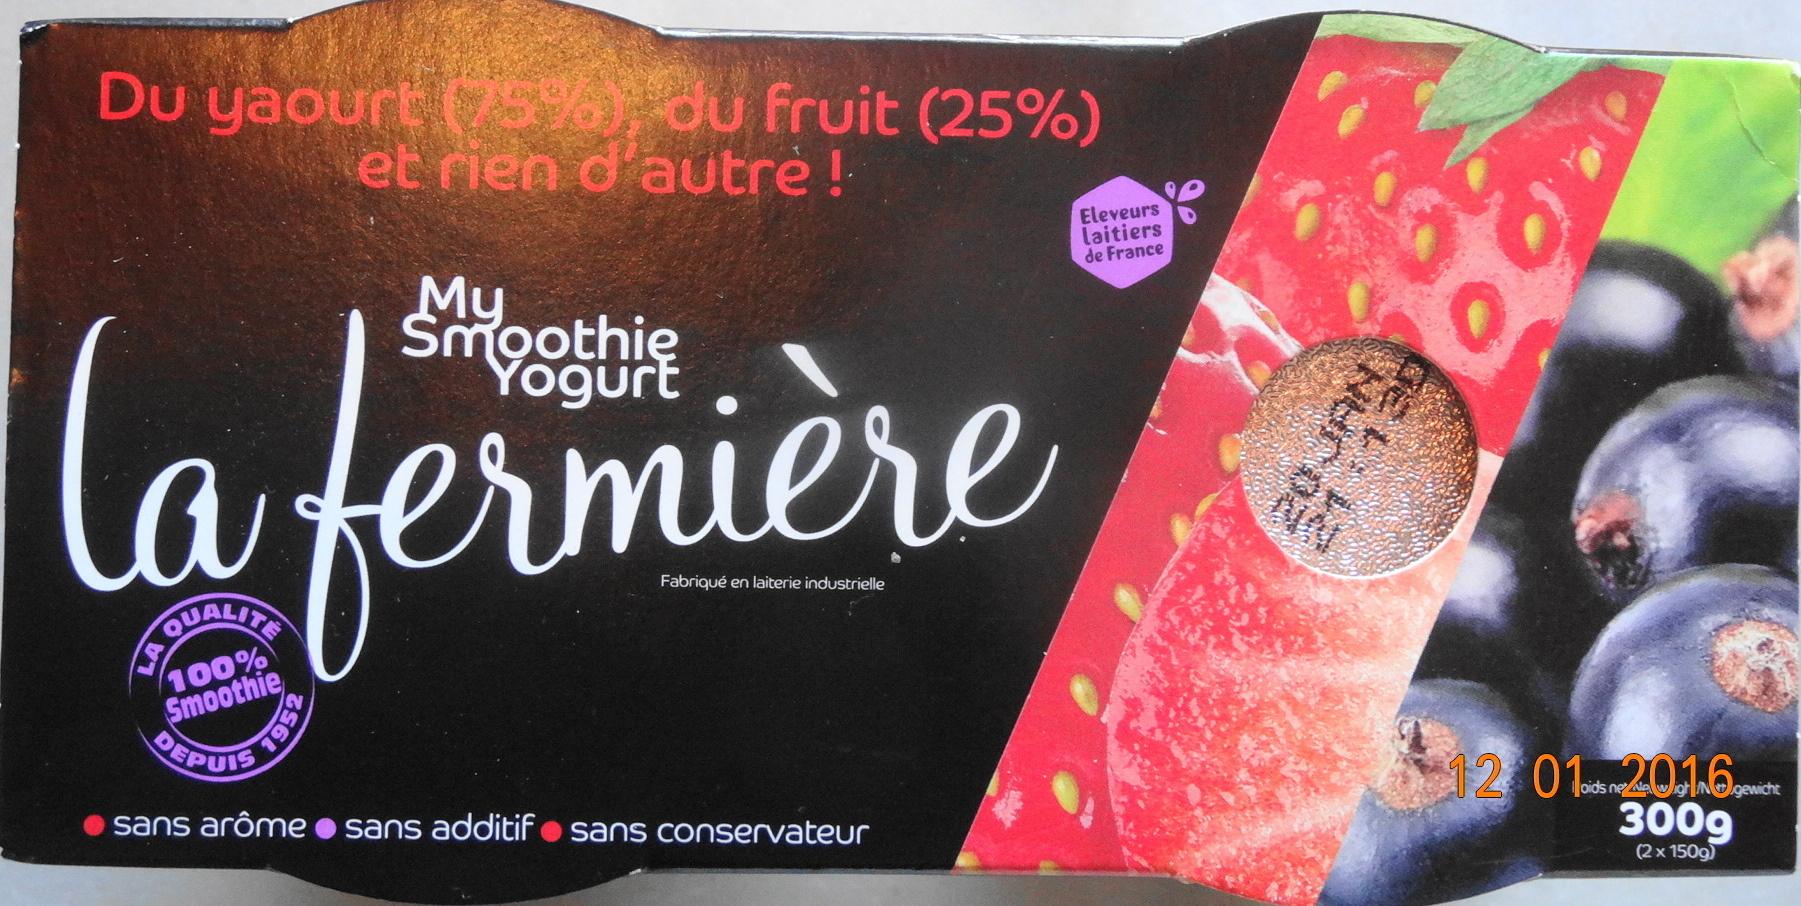 My smoothie Yogurt, fraise-cassis - Product - fr